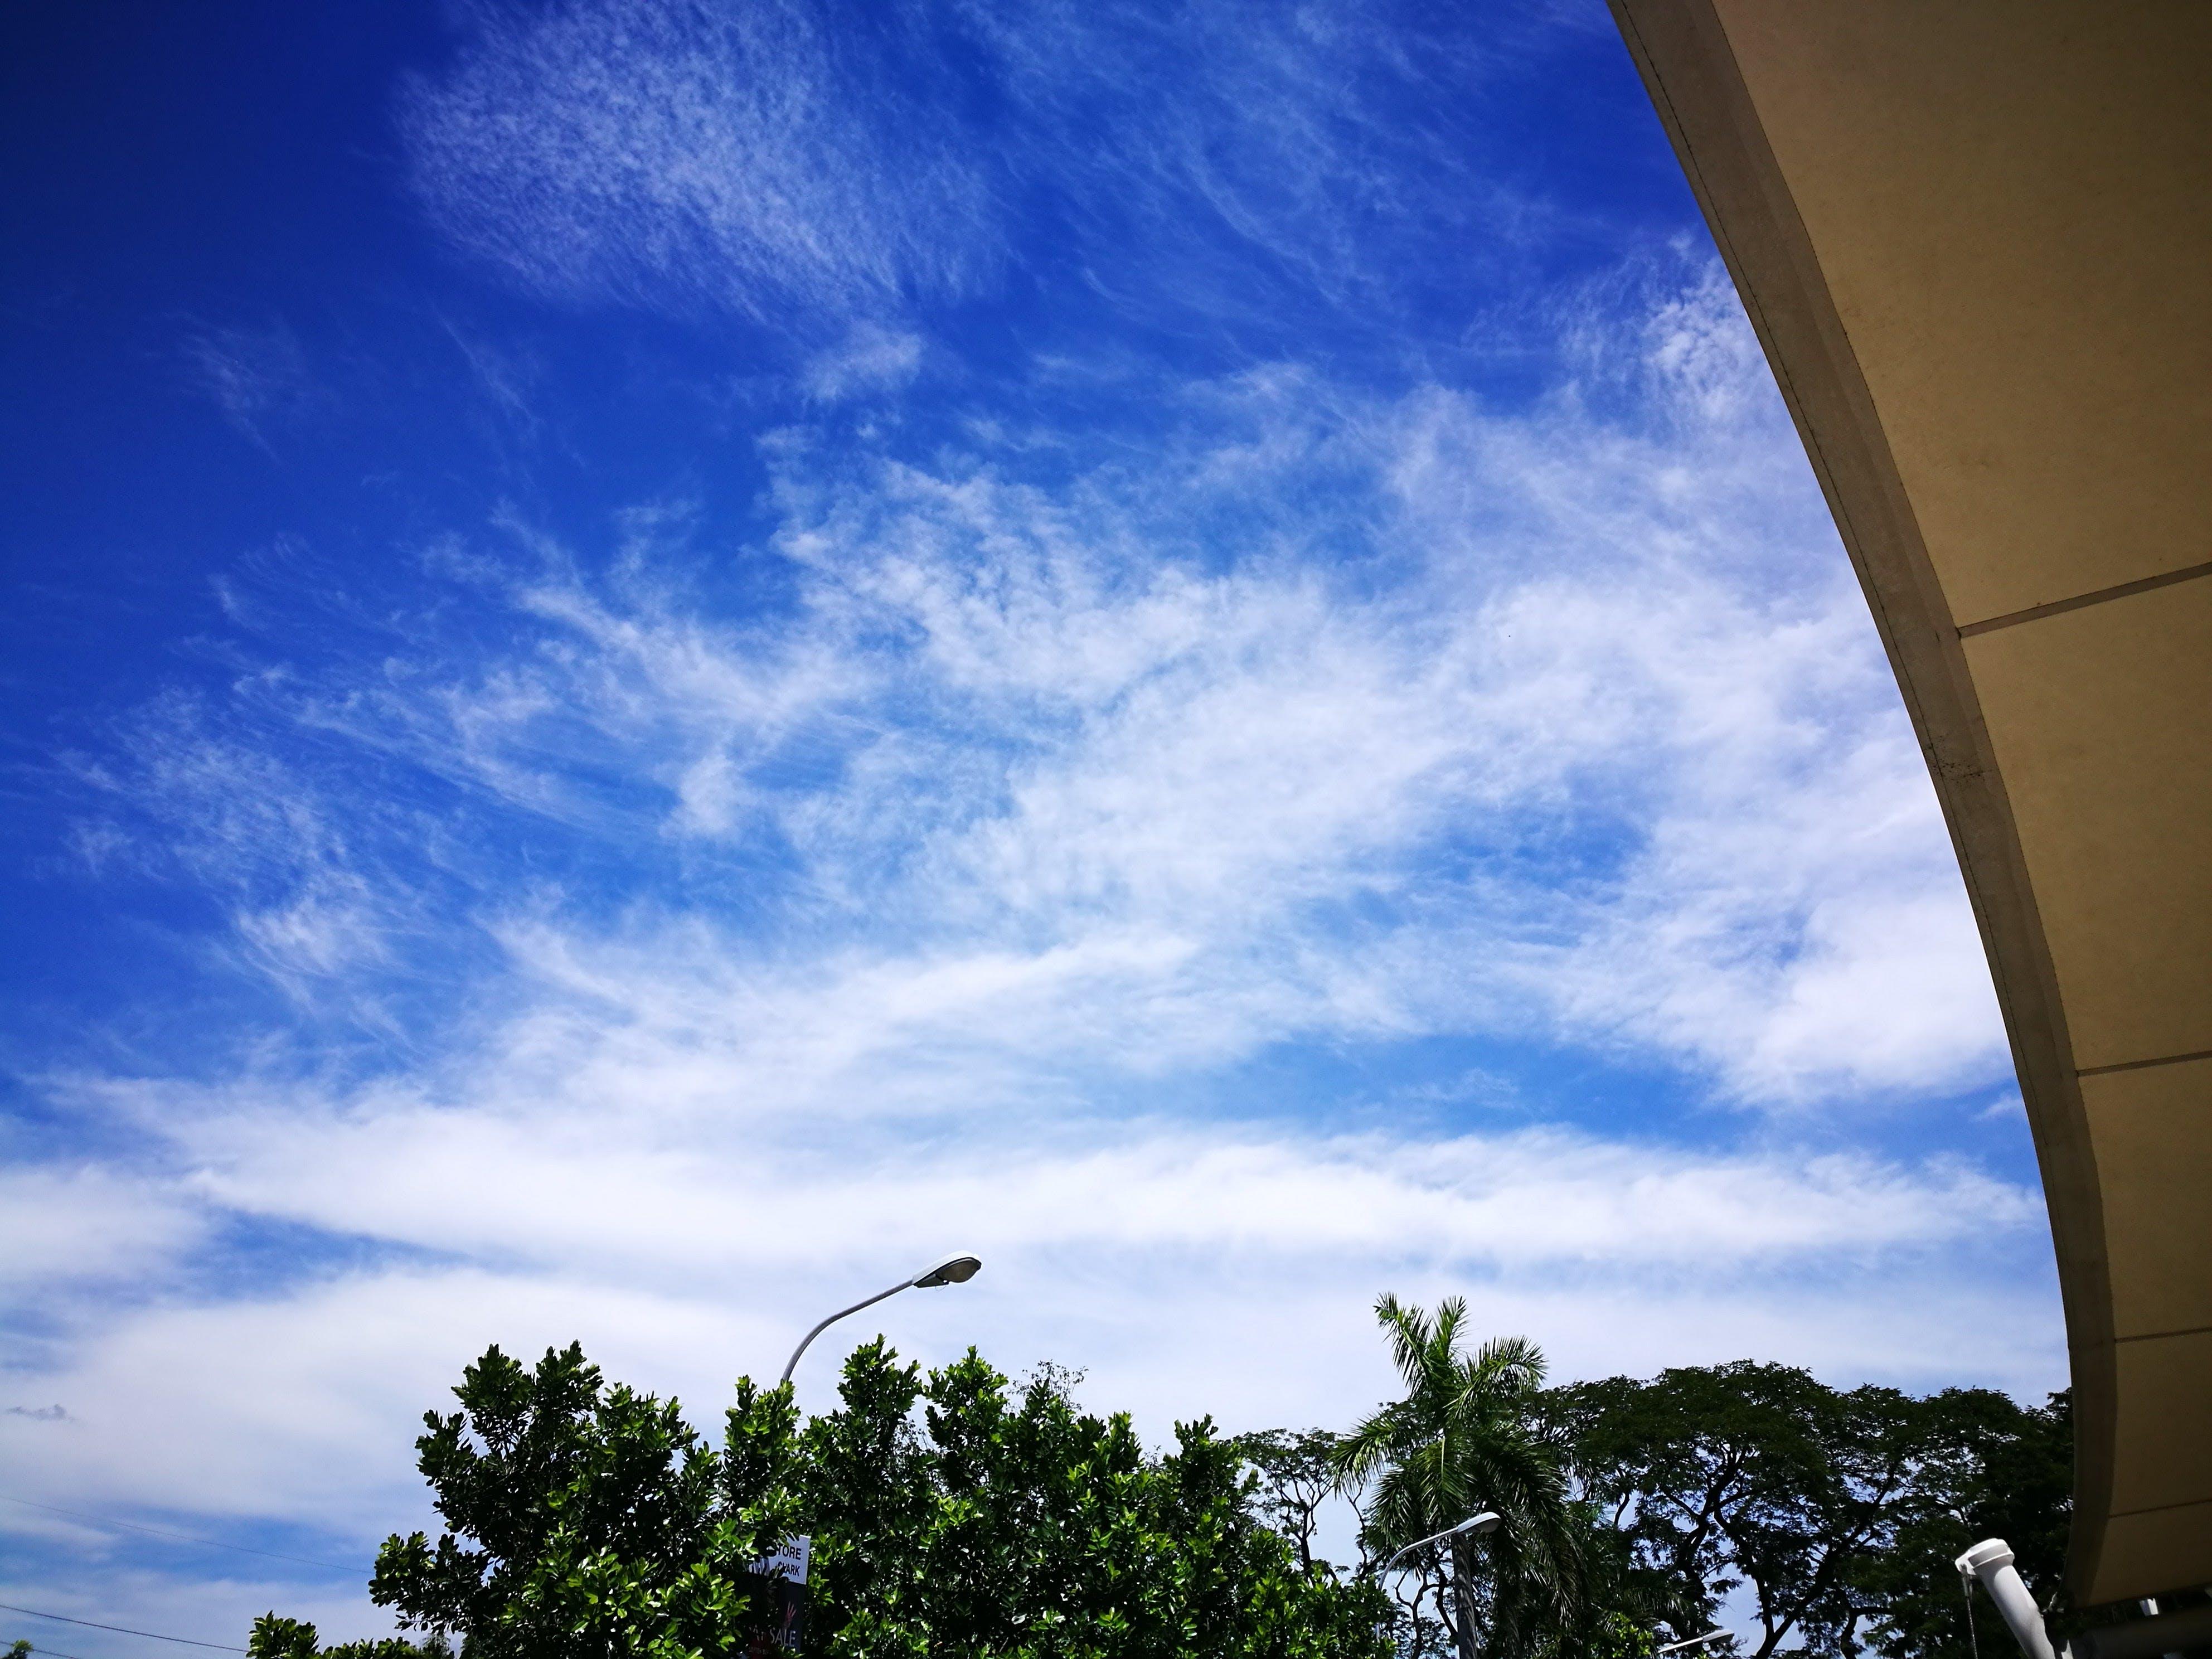 blue sky, ceiling, clouds